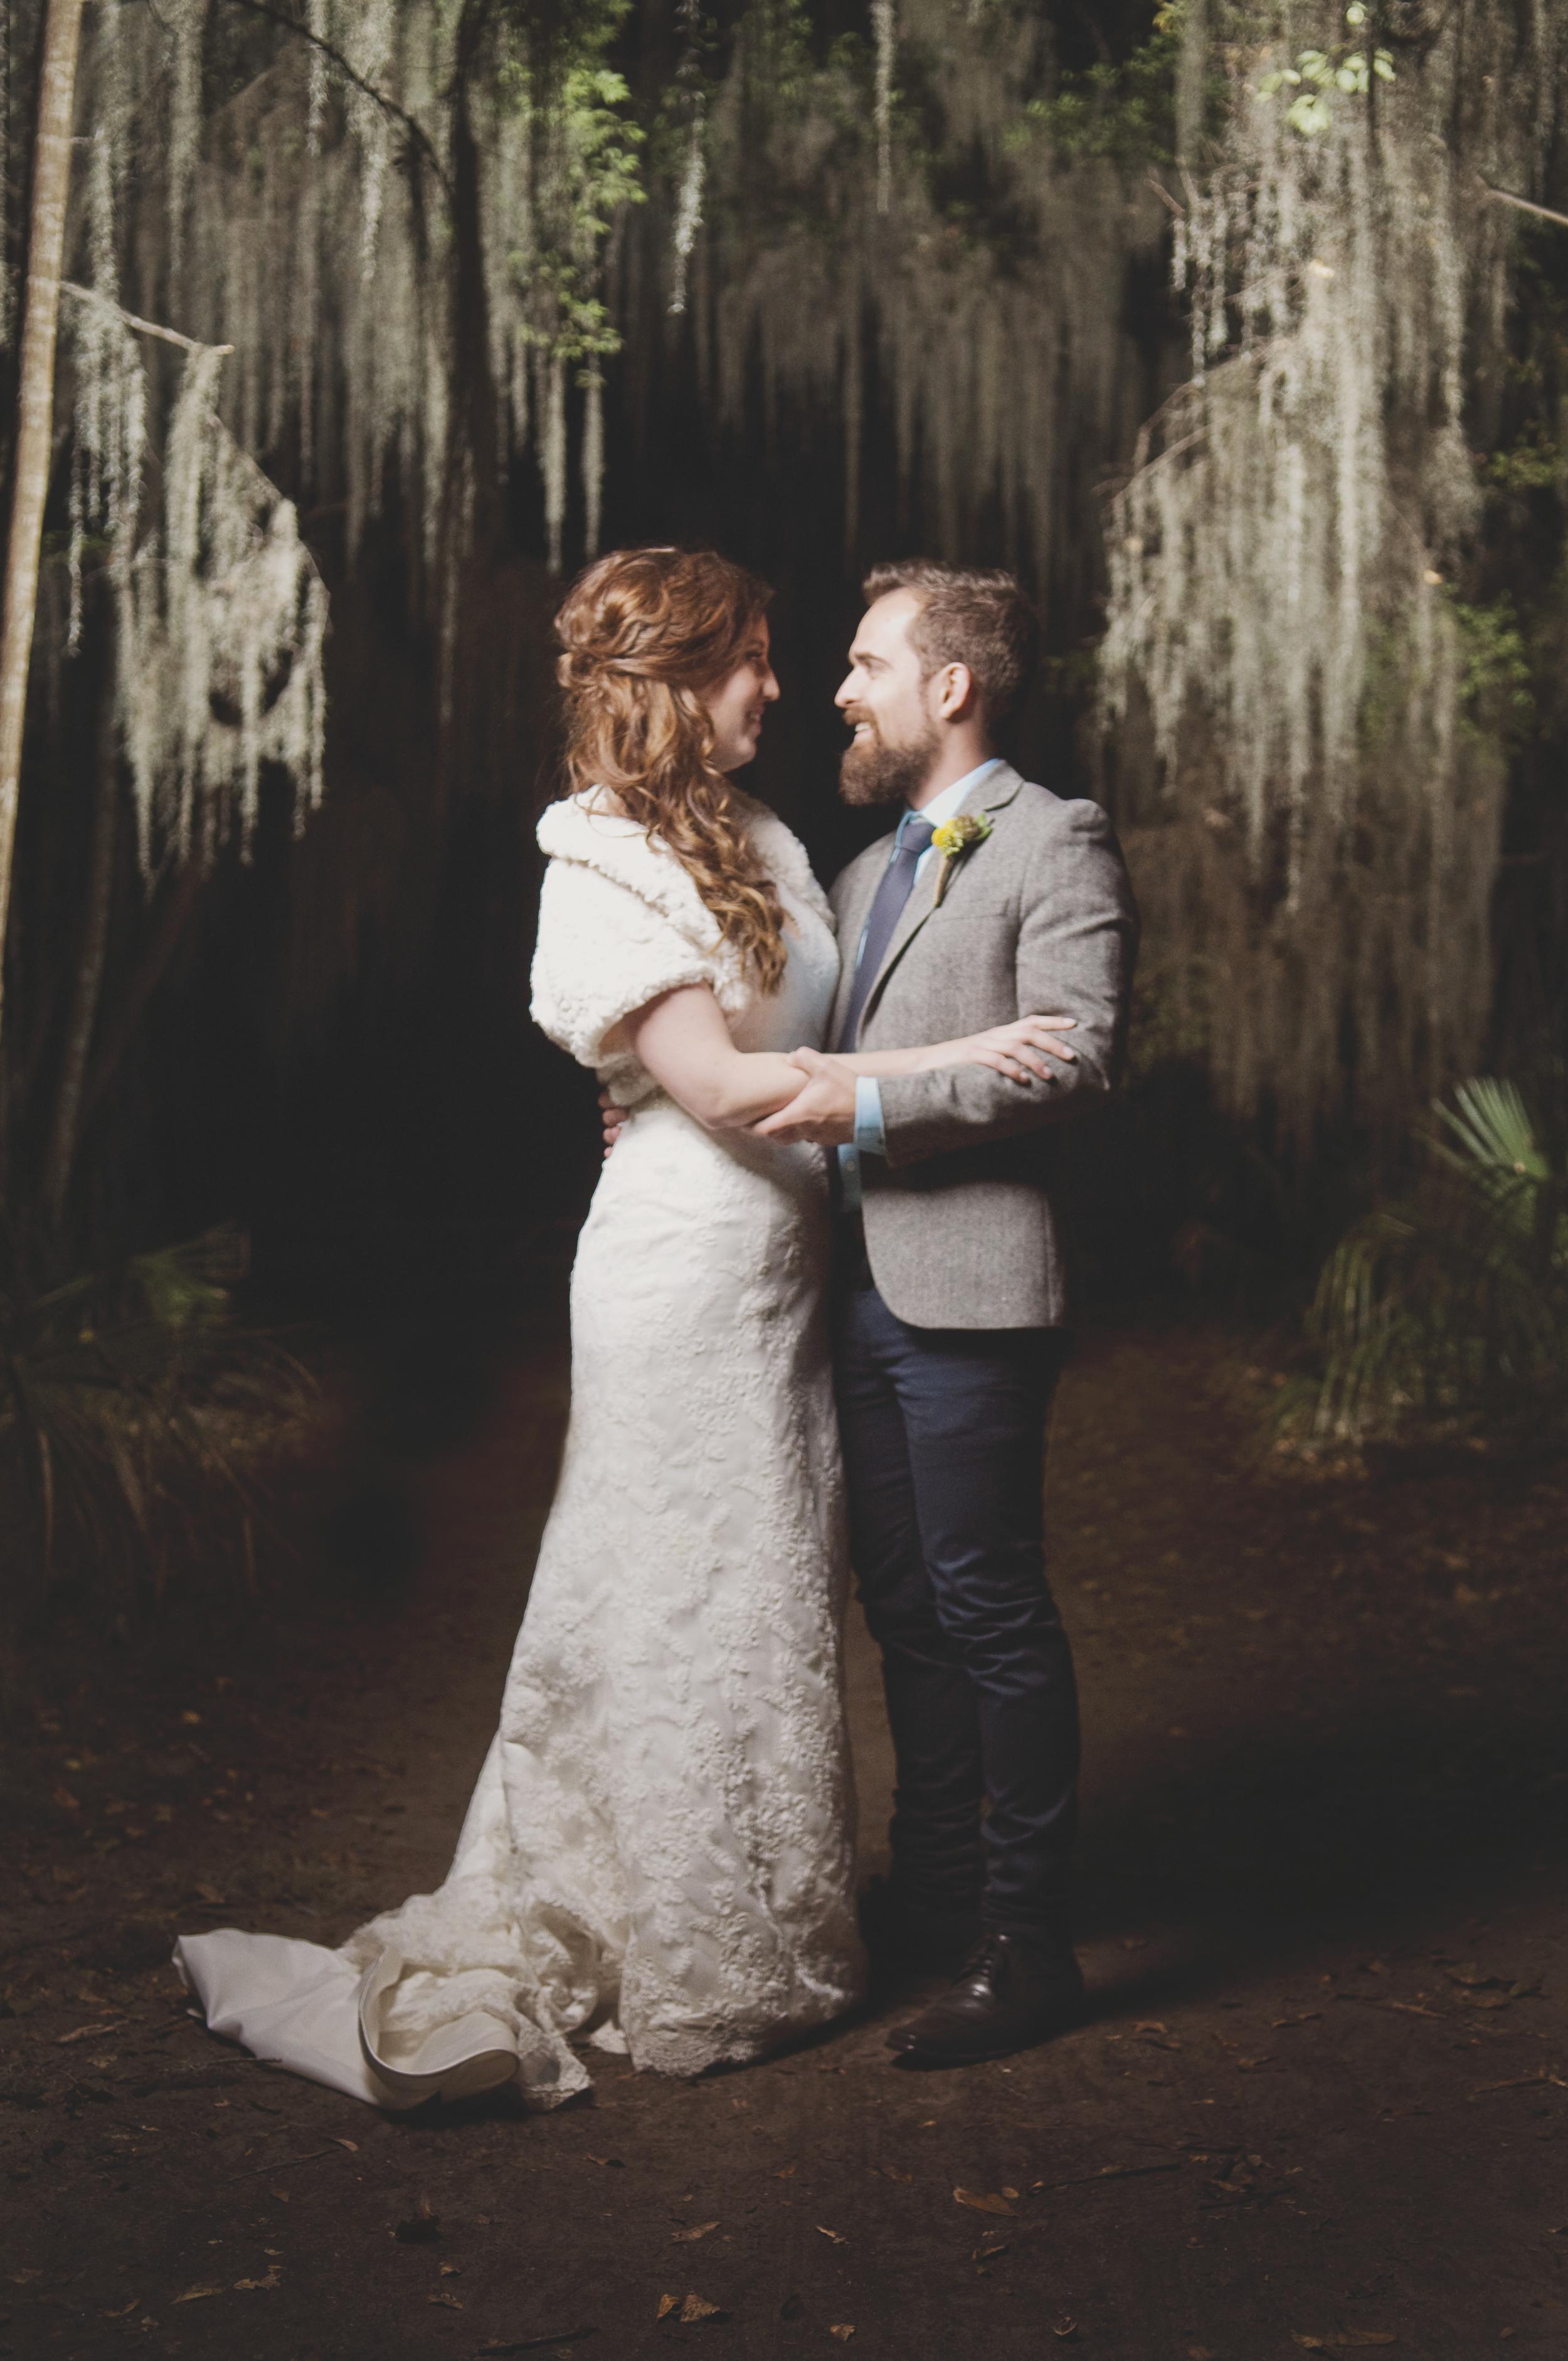 amber-and-david-ivory-and-beau-bridal-boutique-lytle-foto-savannah-wedding-dresses-savannah-wedding-planner-savannah-event-designer-savannah-weddings-wormsloe-wedding-cohens-retreat-wedding-indie-wedding-handmade-wedding-historic-33.jpg